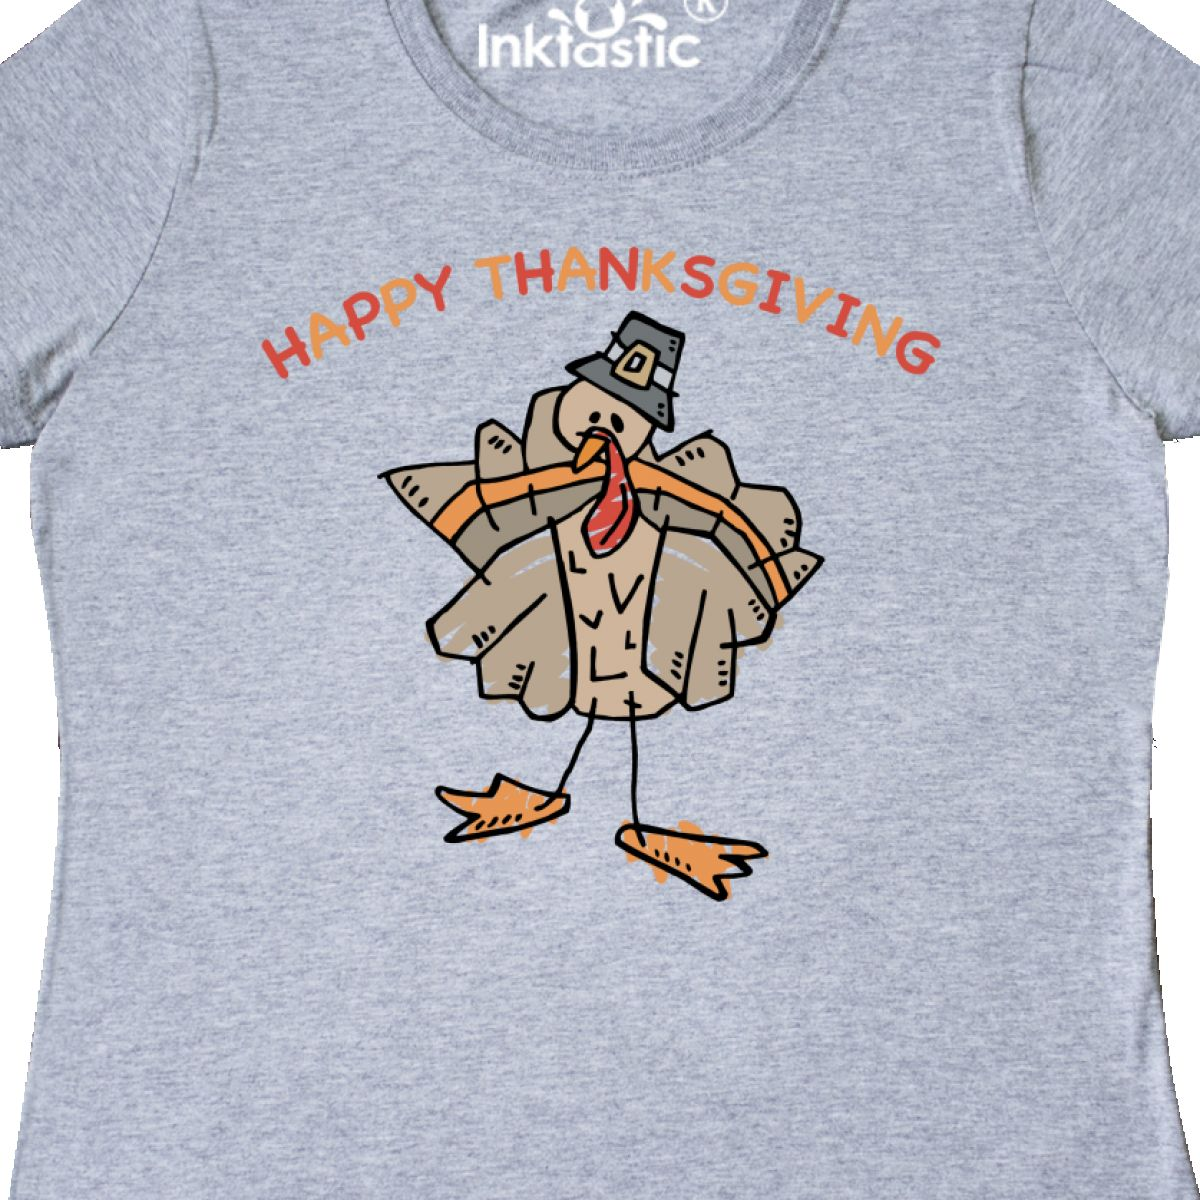 90cd5da57 Inktastic Happy Thanksgiving Women's T-Shirt Turkey Pilgrim Holiday ...